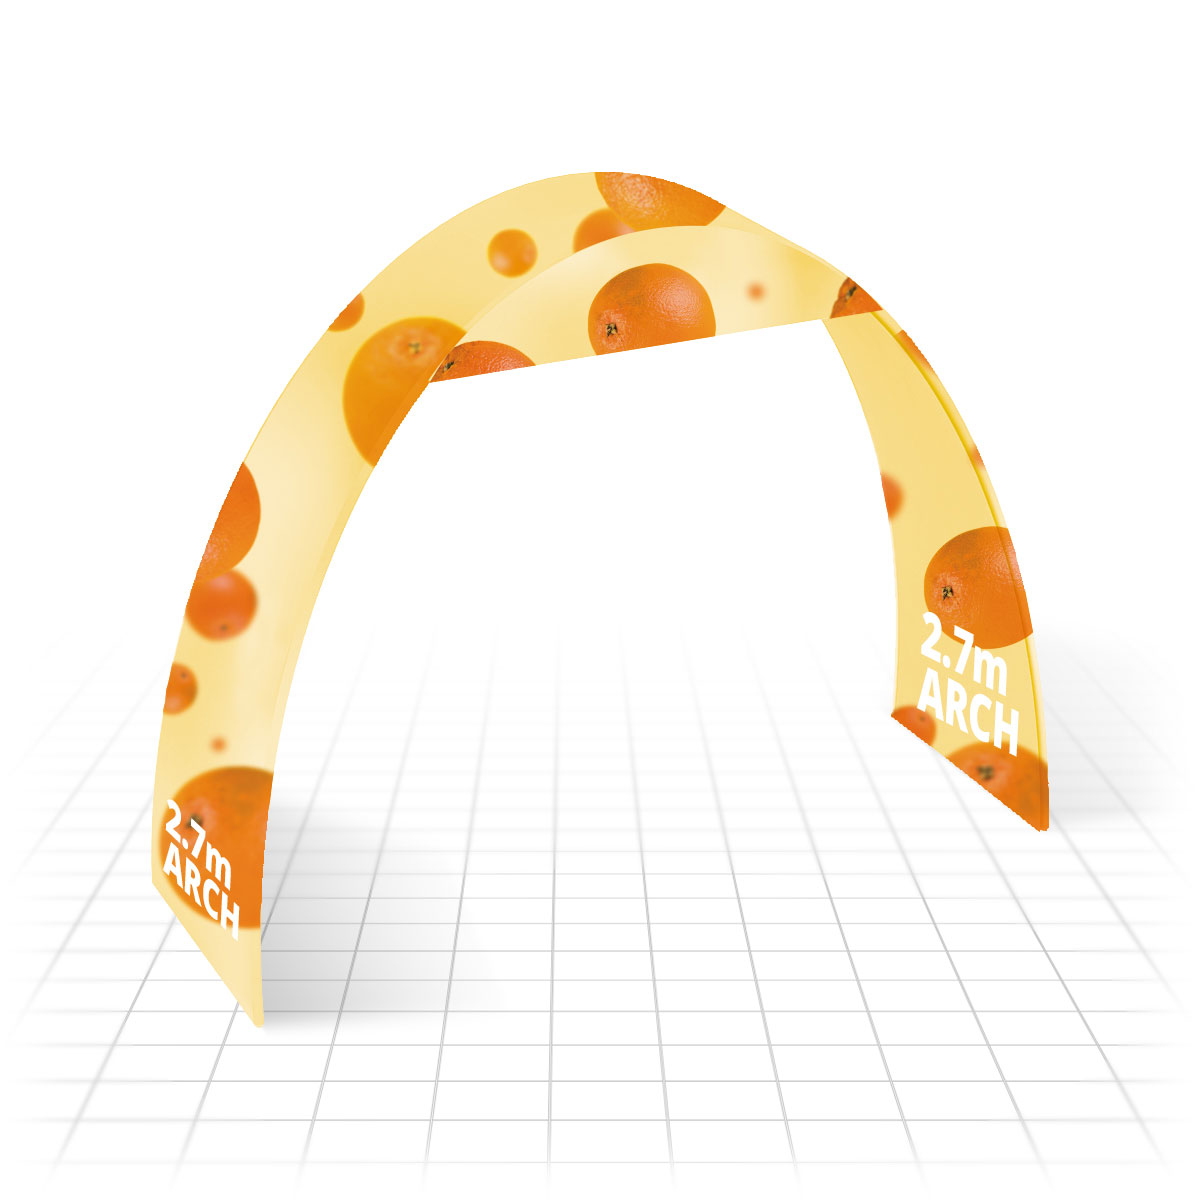 Formulate Arches | Formulate